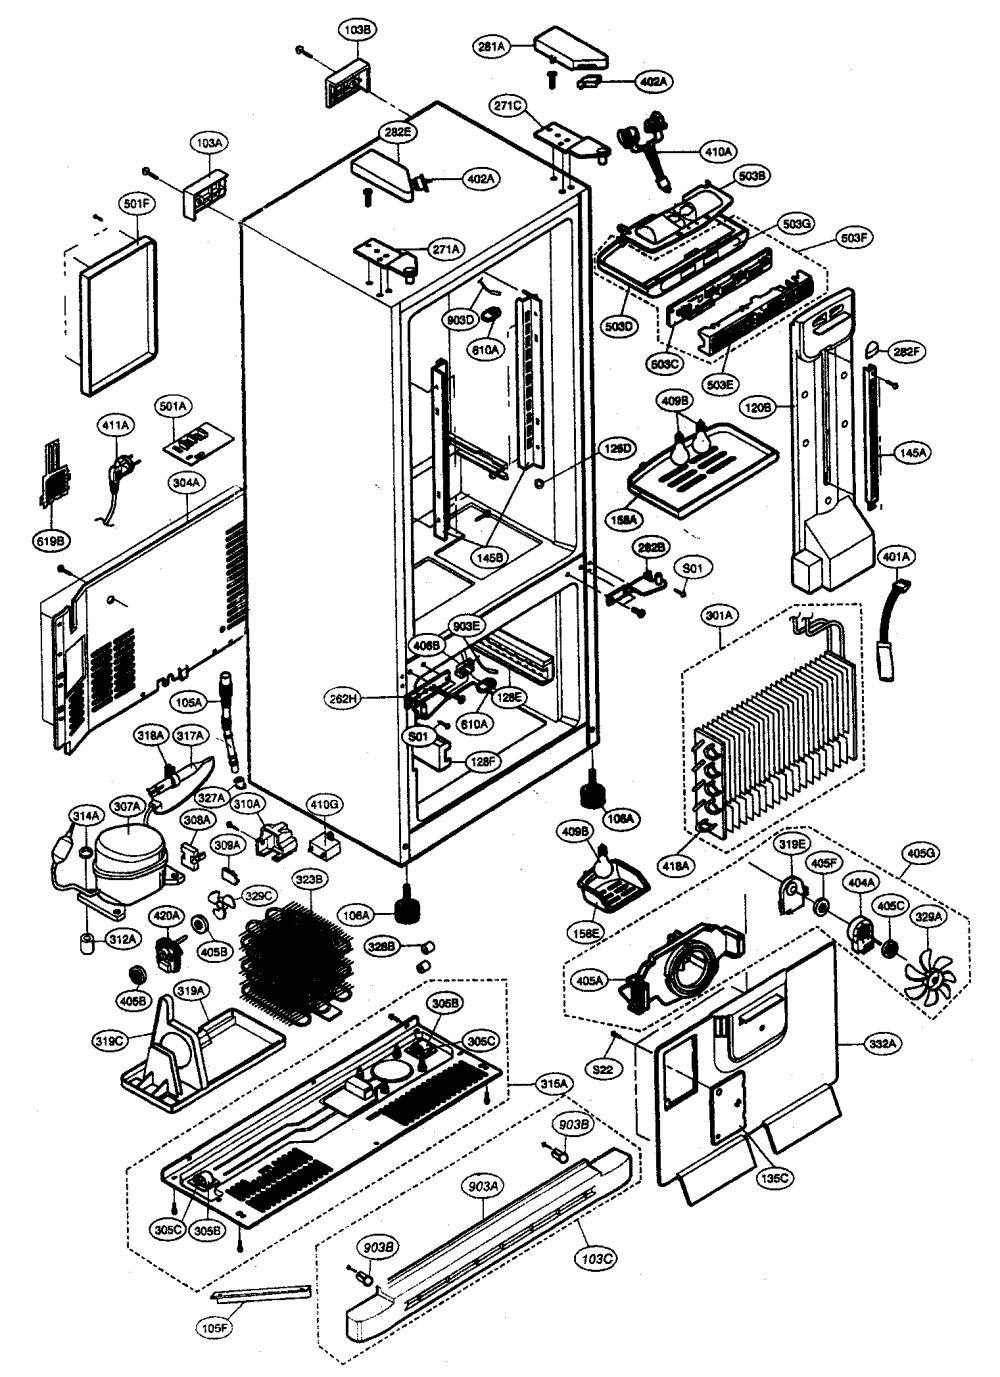 medium resolution of kenmore fridge schematic wiring diagram structure kenmore appliance parts diagrams kenmore fridge schematic wiring diagram expert